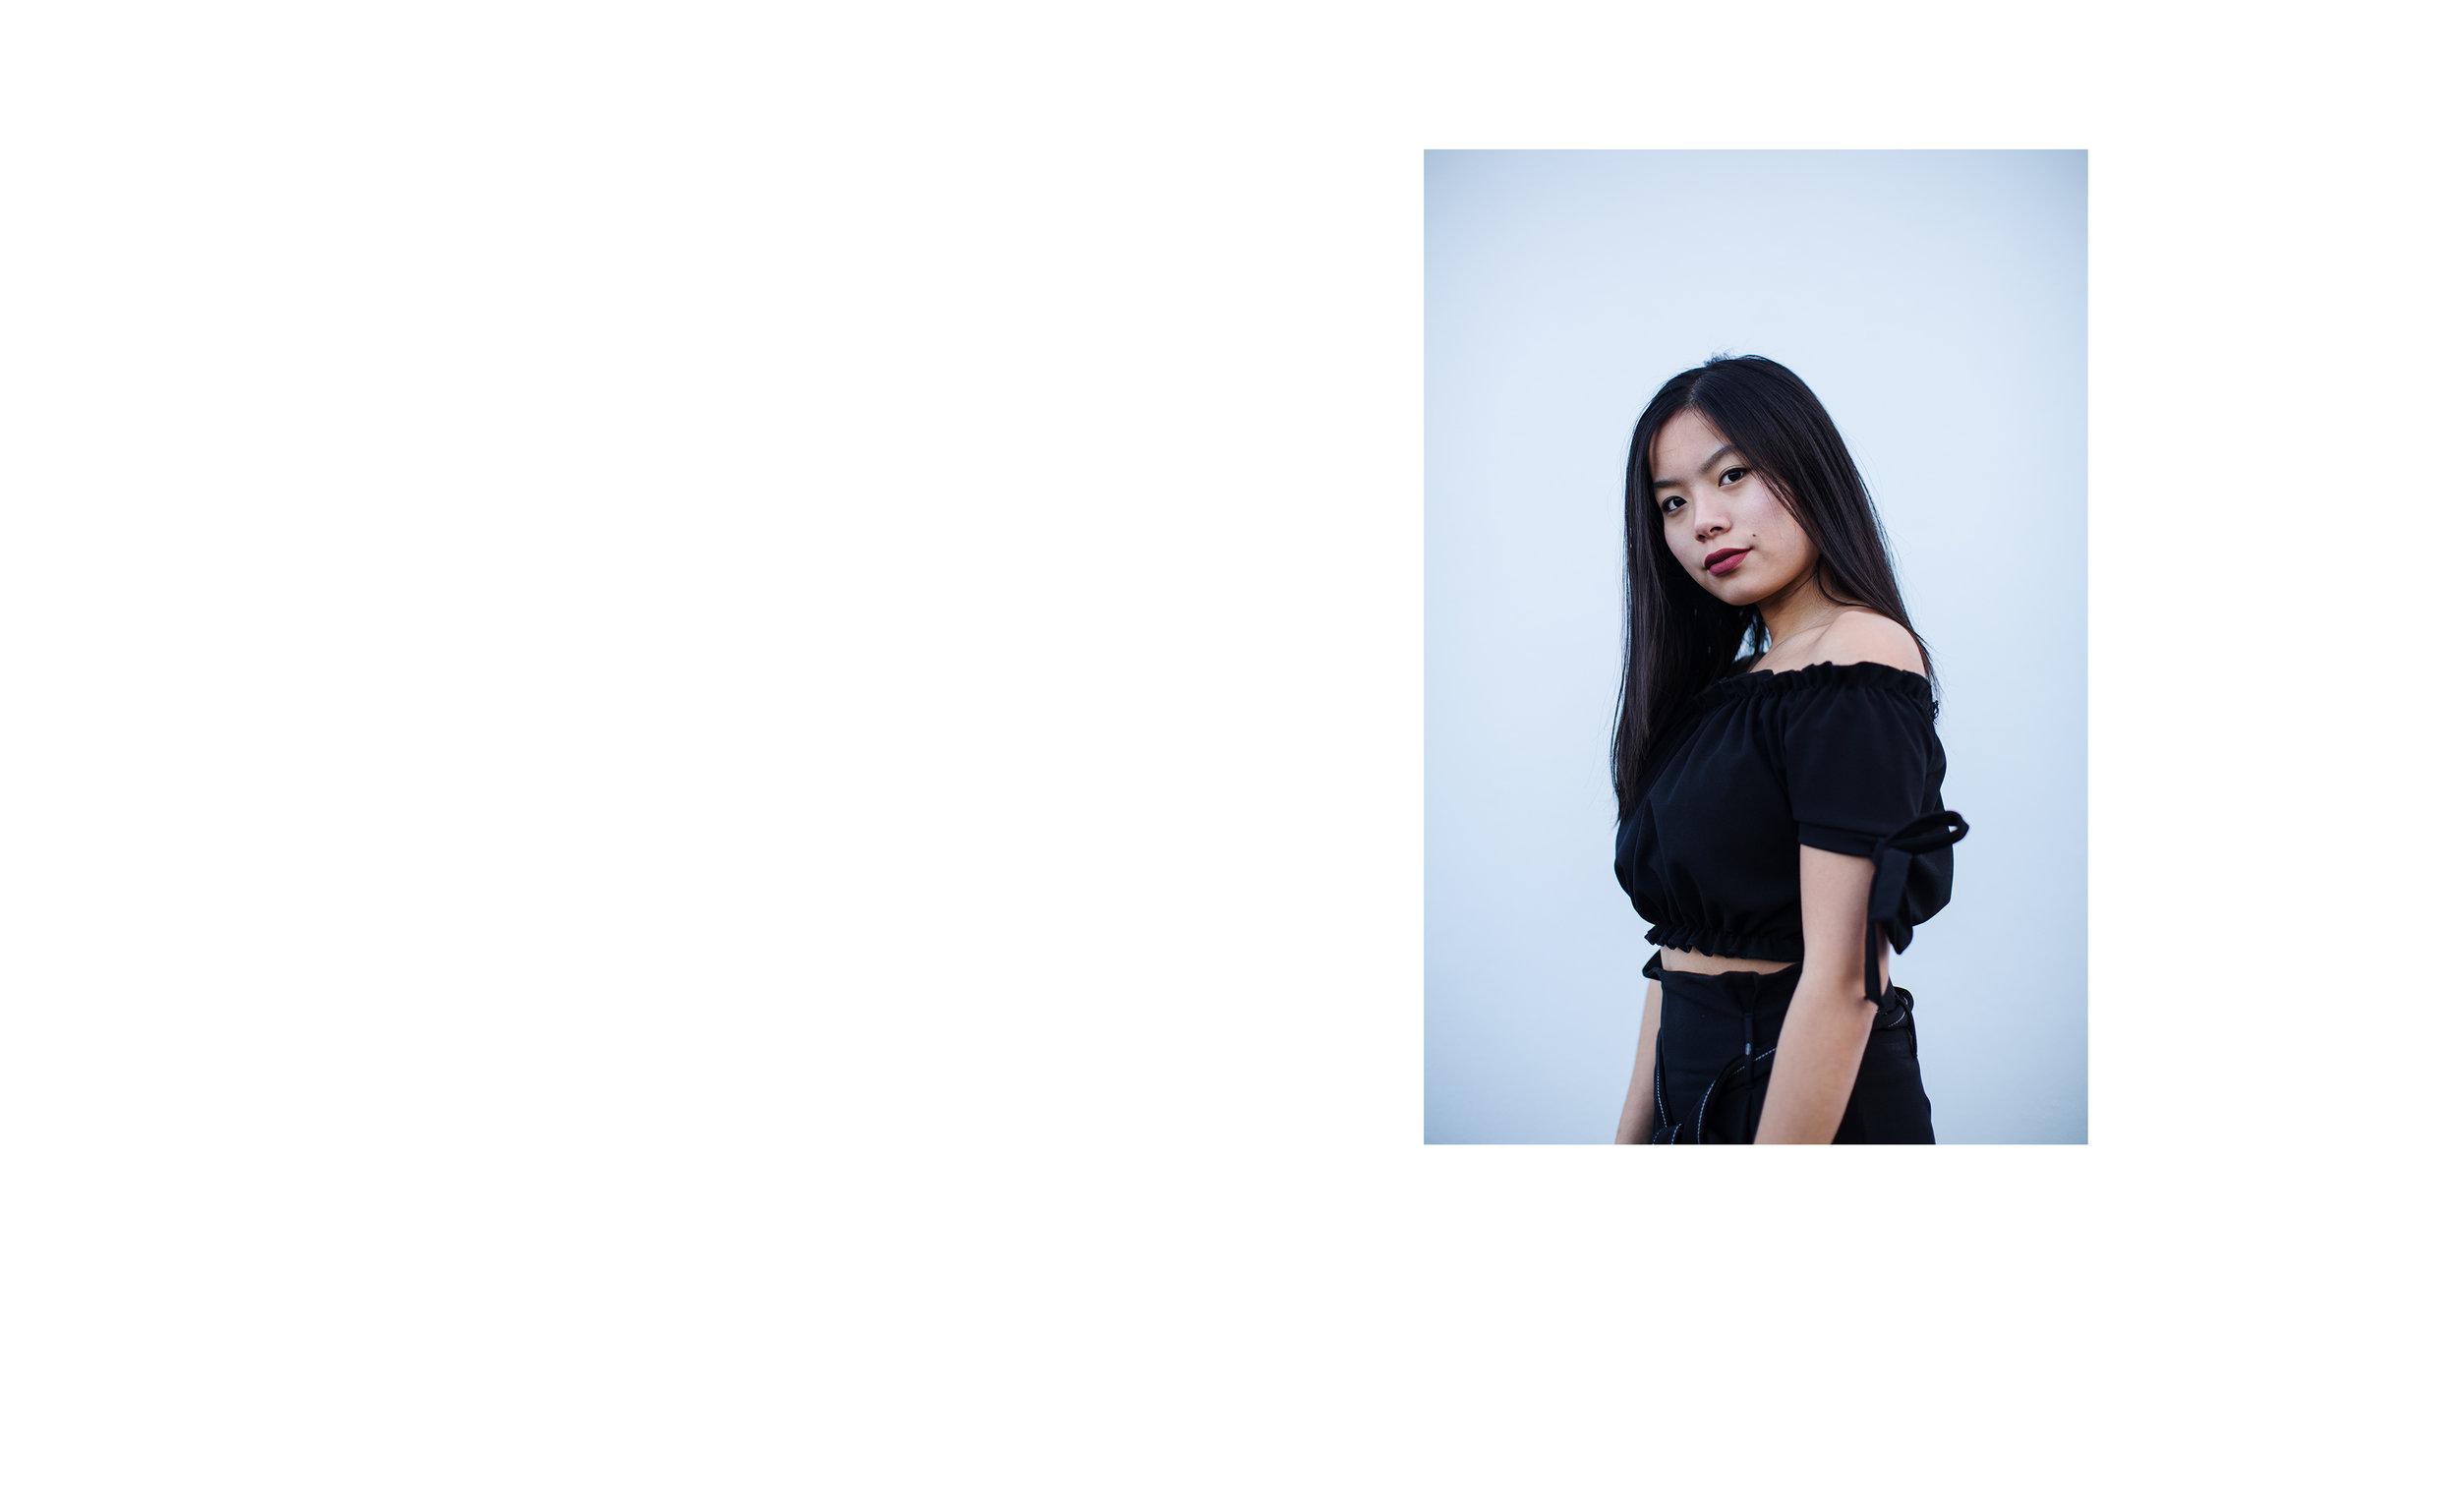 ALL BLACK modelled by Emily Tajima. (4/4)